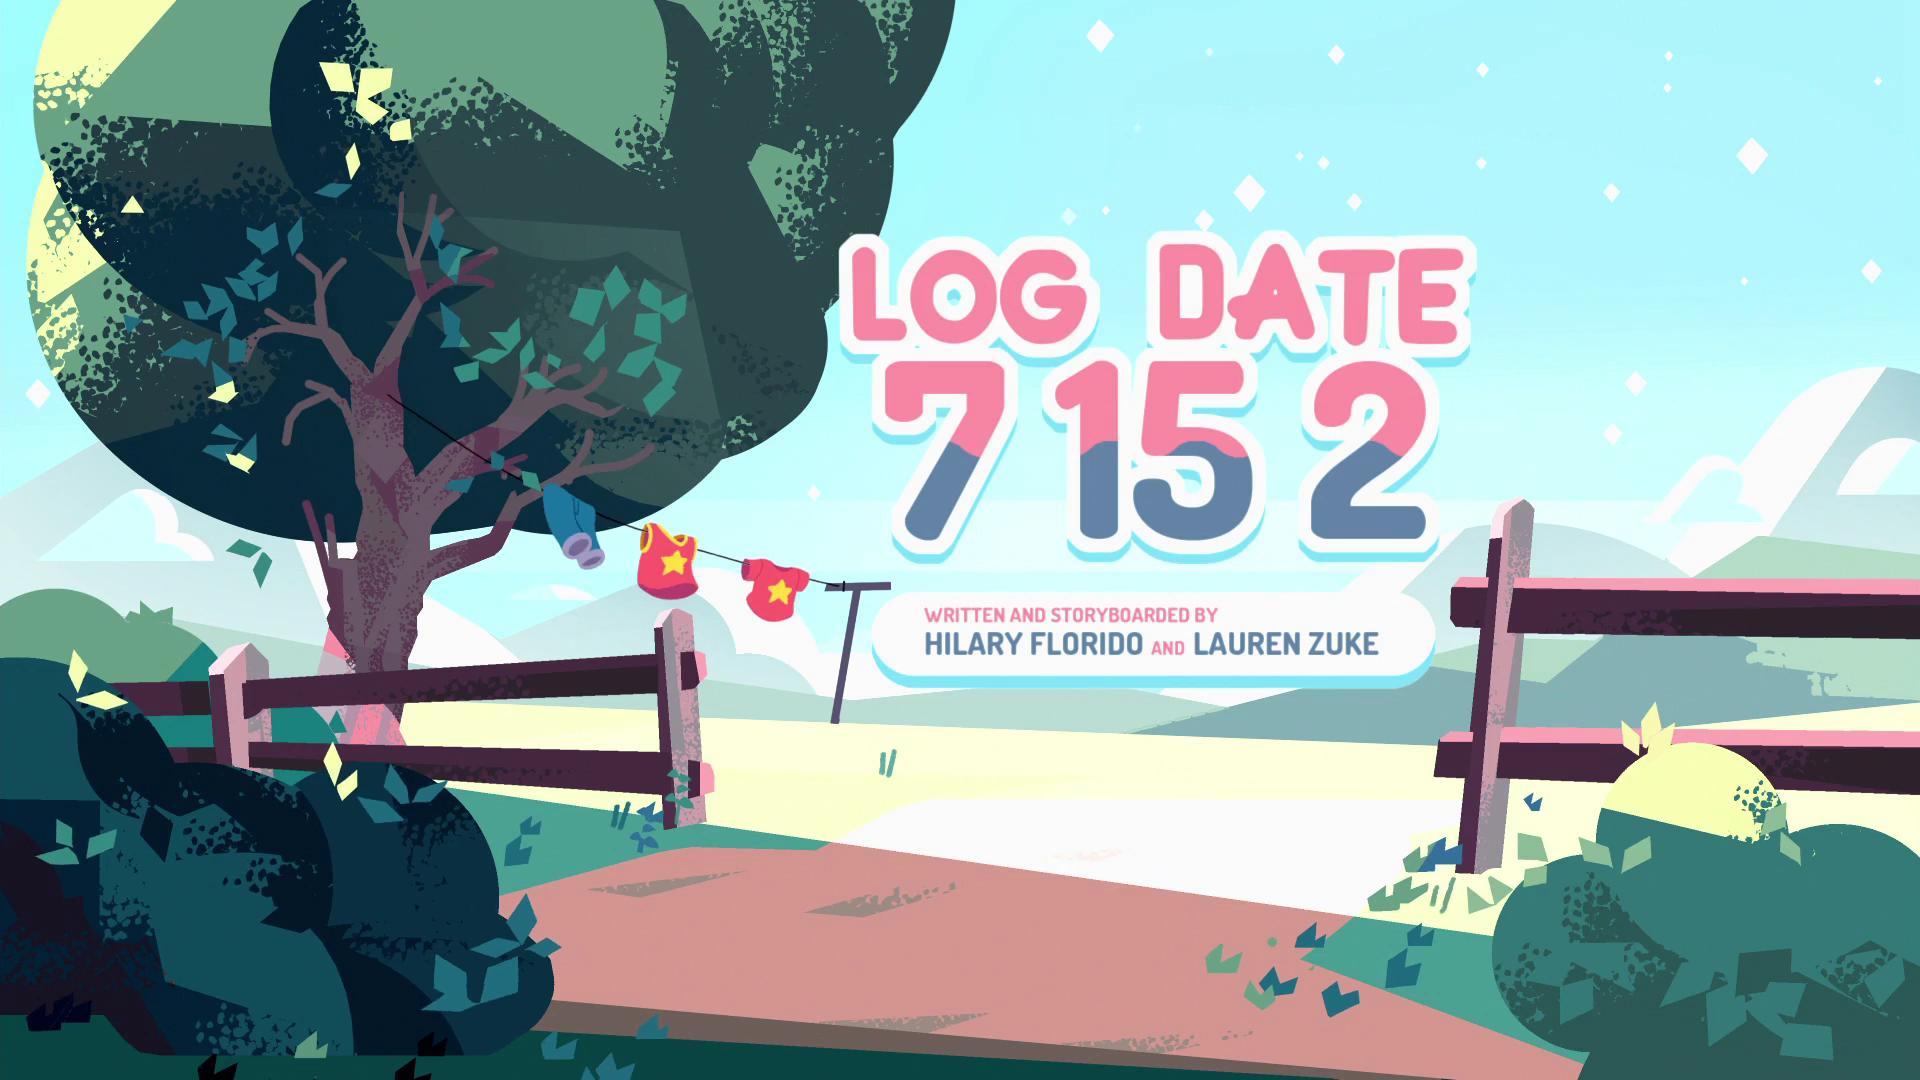 Log Date 7 15 2